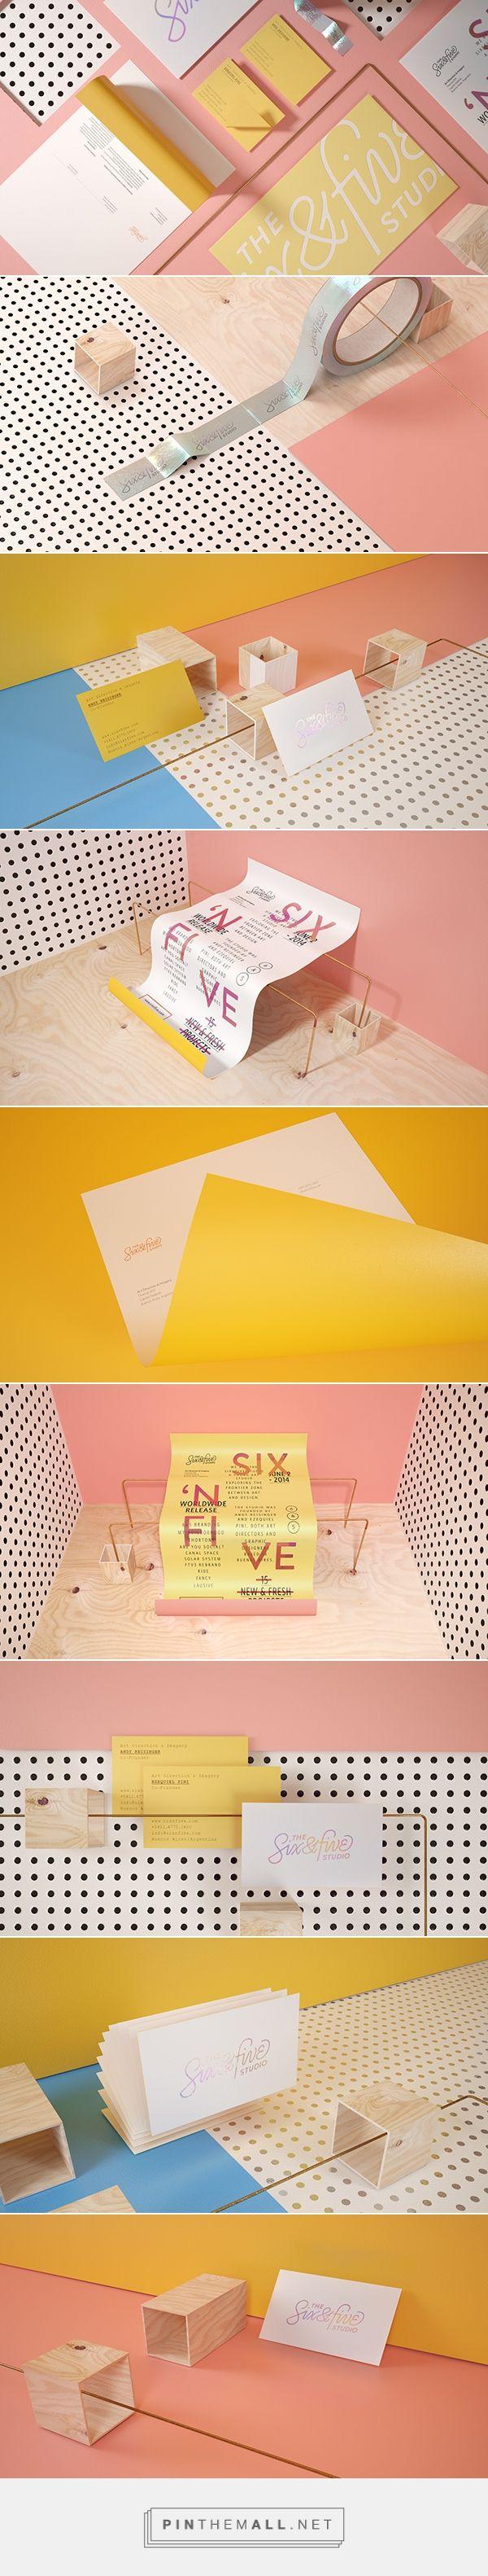 Six N. Five Art Studio Self Branding | Fivestar Branding Agency – Design and Branding Agency & Curated Inspiration Gallery